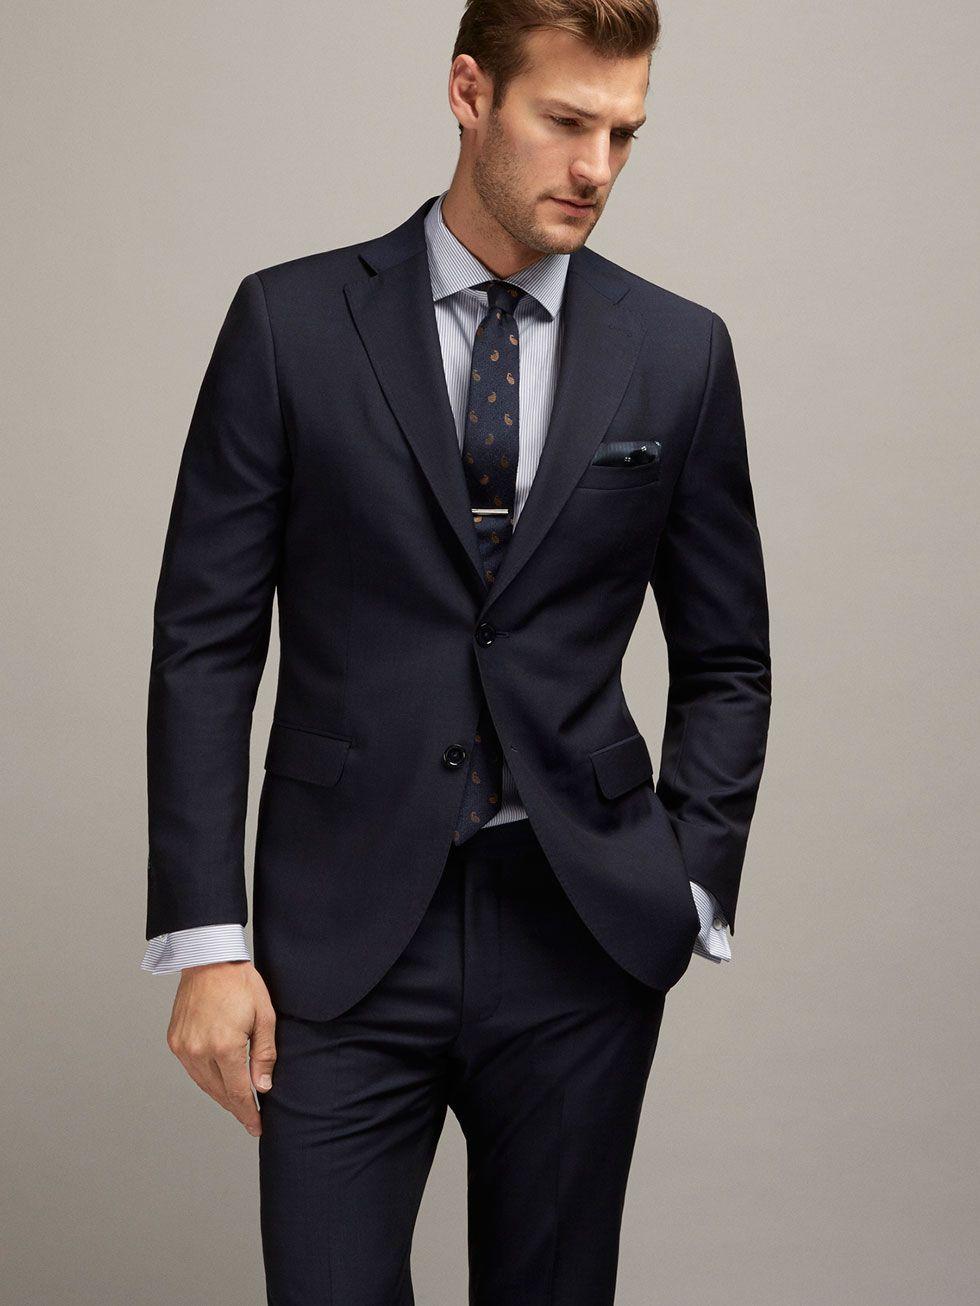 Americana Traje Lana Cuadrille Azul Slim Fit De Hombre Trajes Trajes Slim Fit De Massimo Dutti De Otono Invierno 2016 Por 199 Suits Mens Suits Wool Blazer